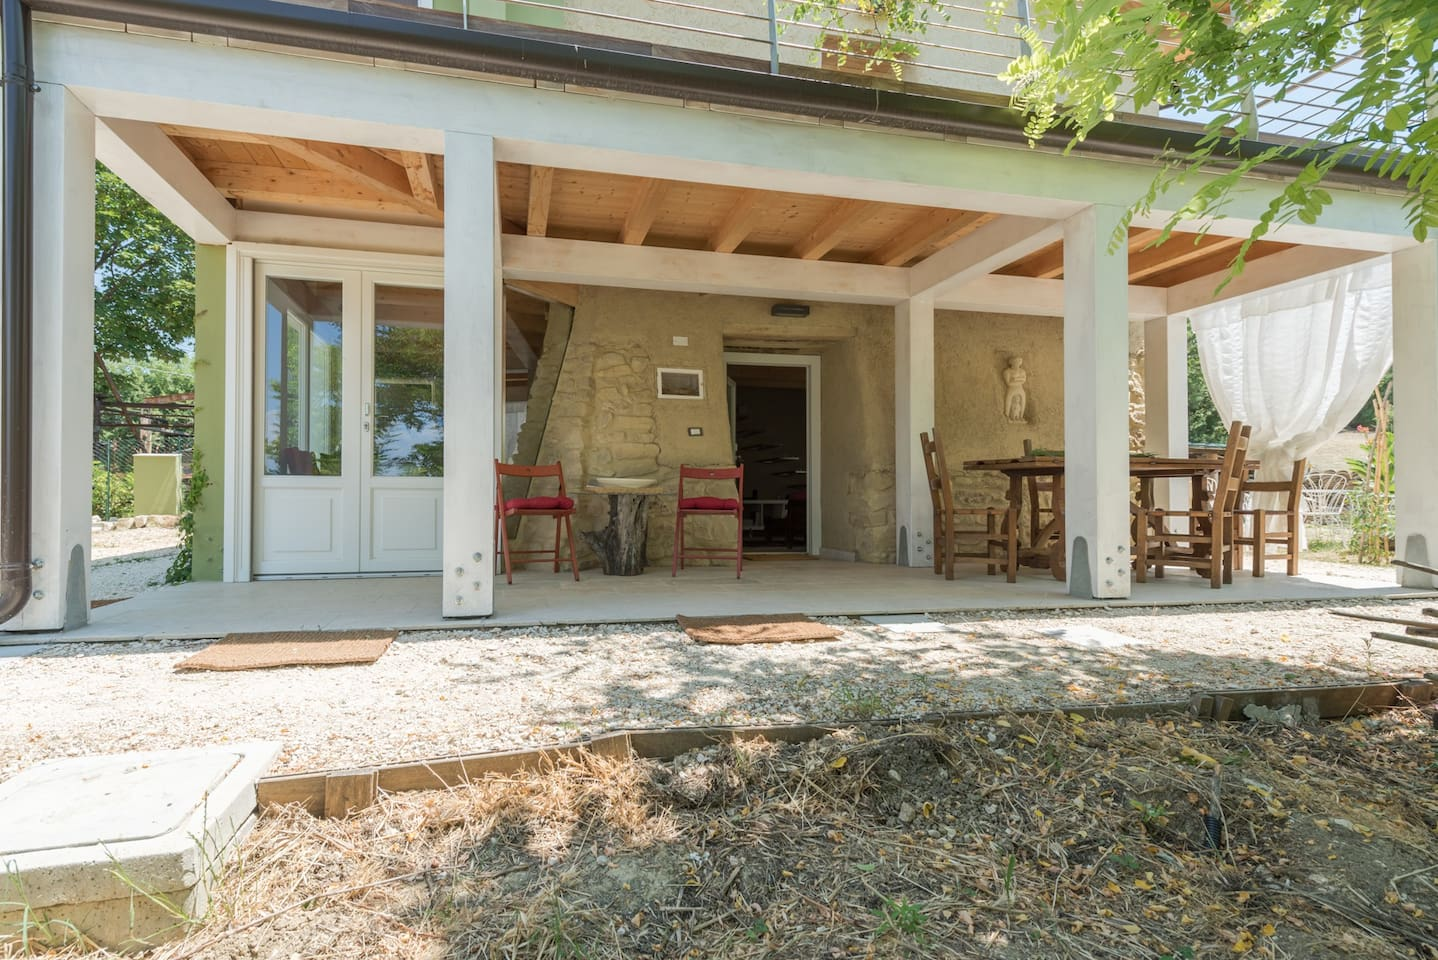 L'ESPERIENZA DI VIVERE IN UNA CASA DI TERRA: SENTINELLA GUEST HOUSE A CASALINCONTRADA – CH – ITALY